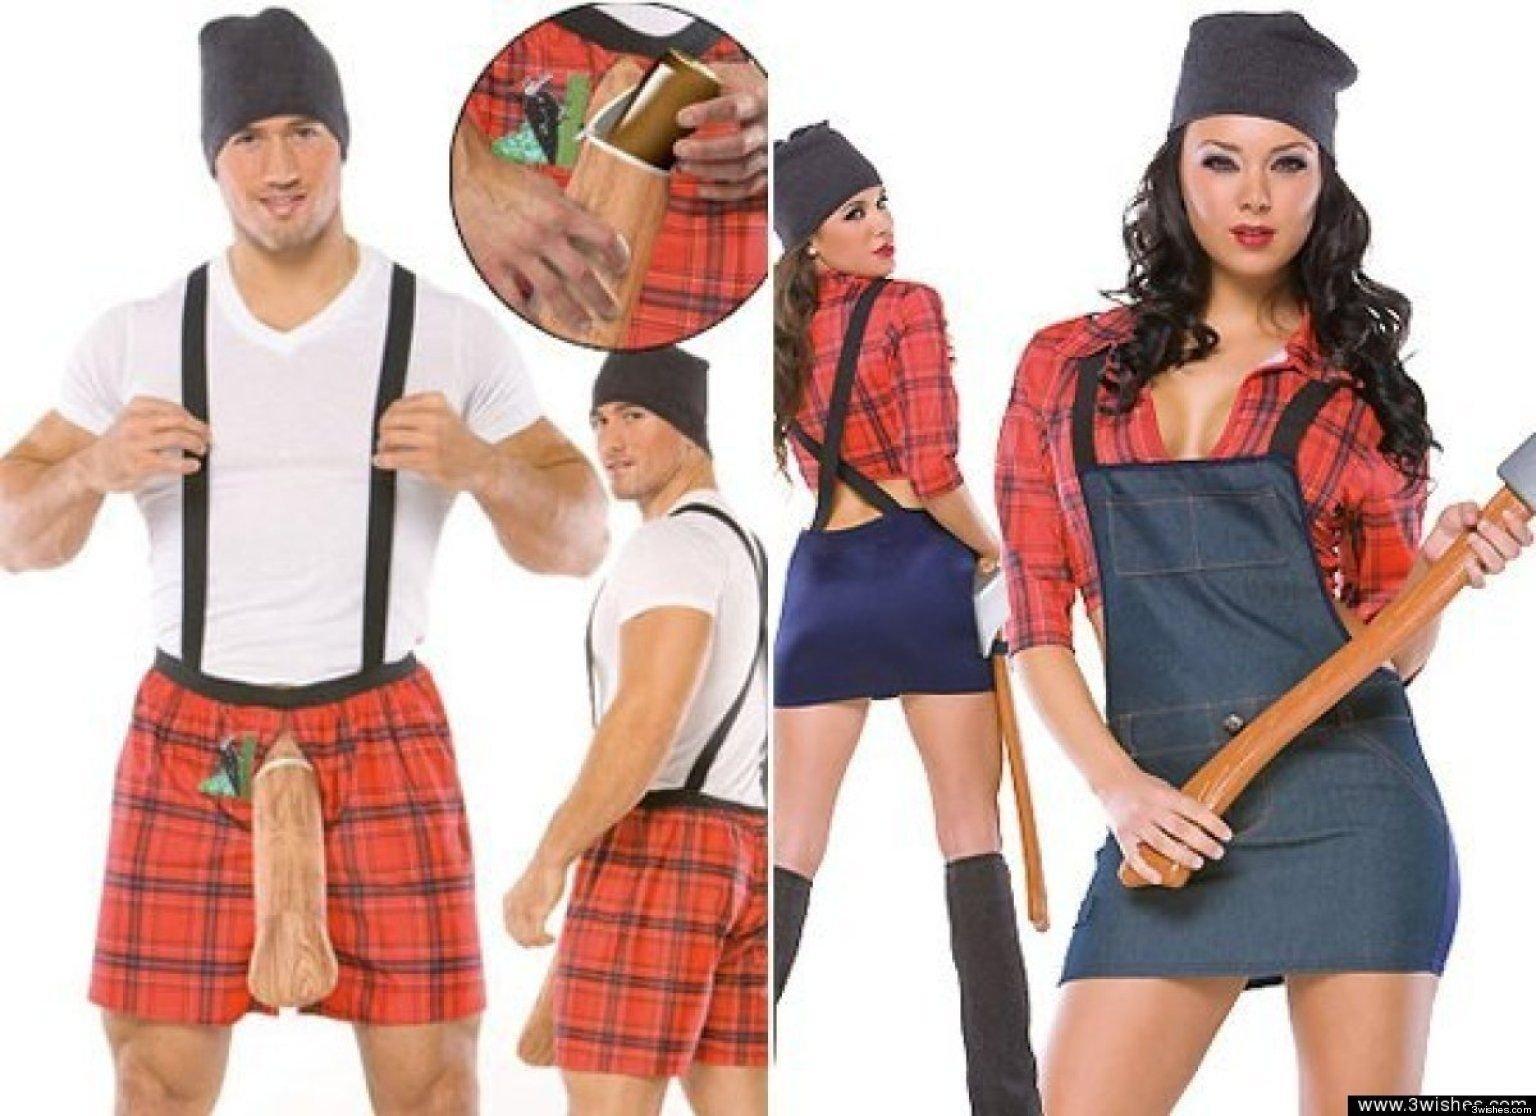 10 Pretty Good Couples Halloween Costume Ideas look 5 extremely awkward couples costumes costumes couple 6 2020